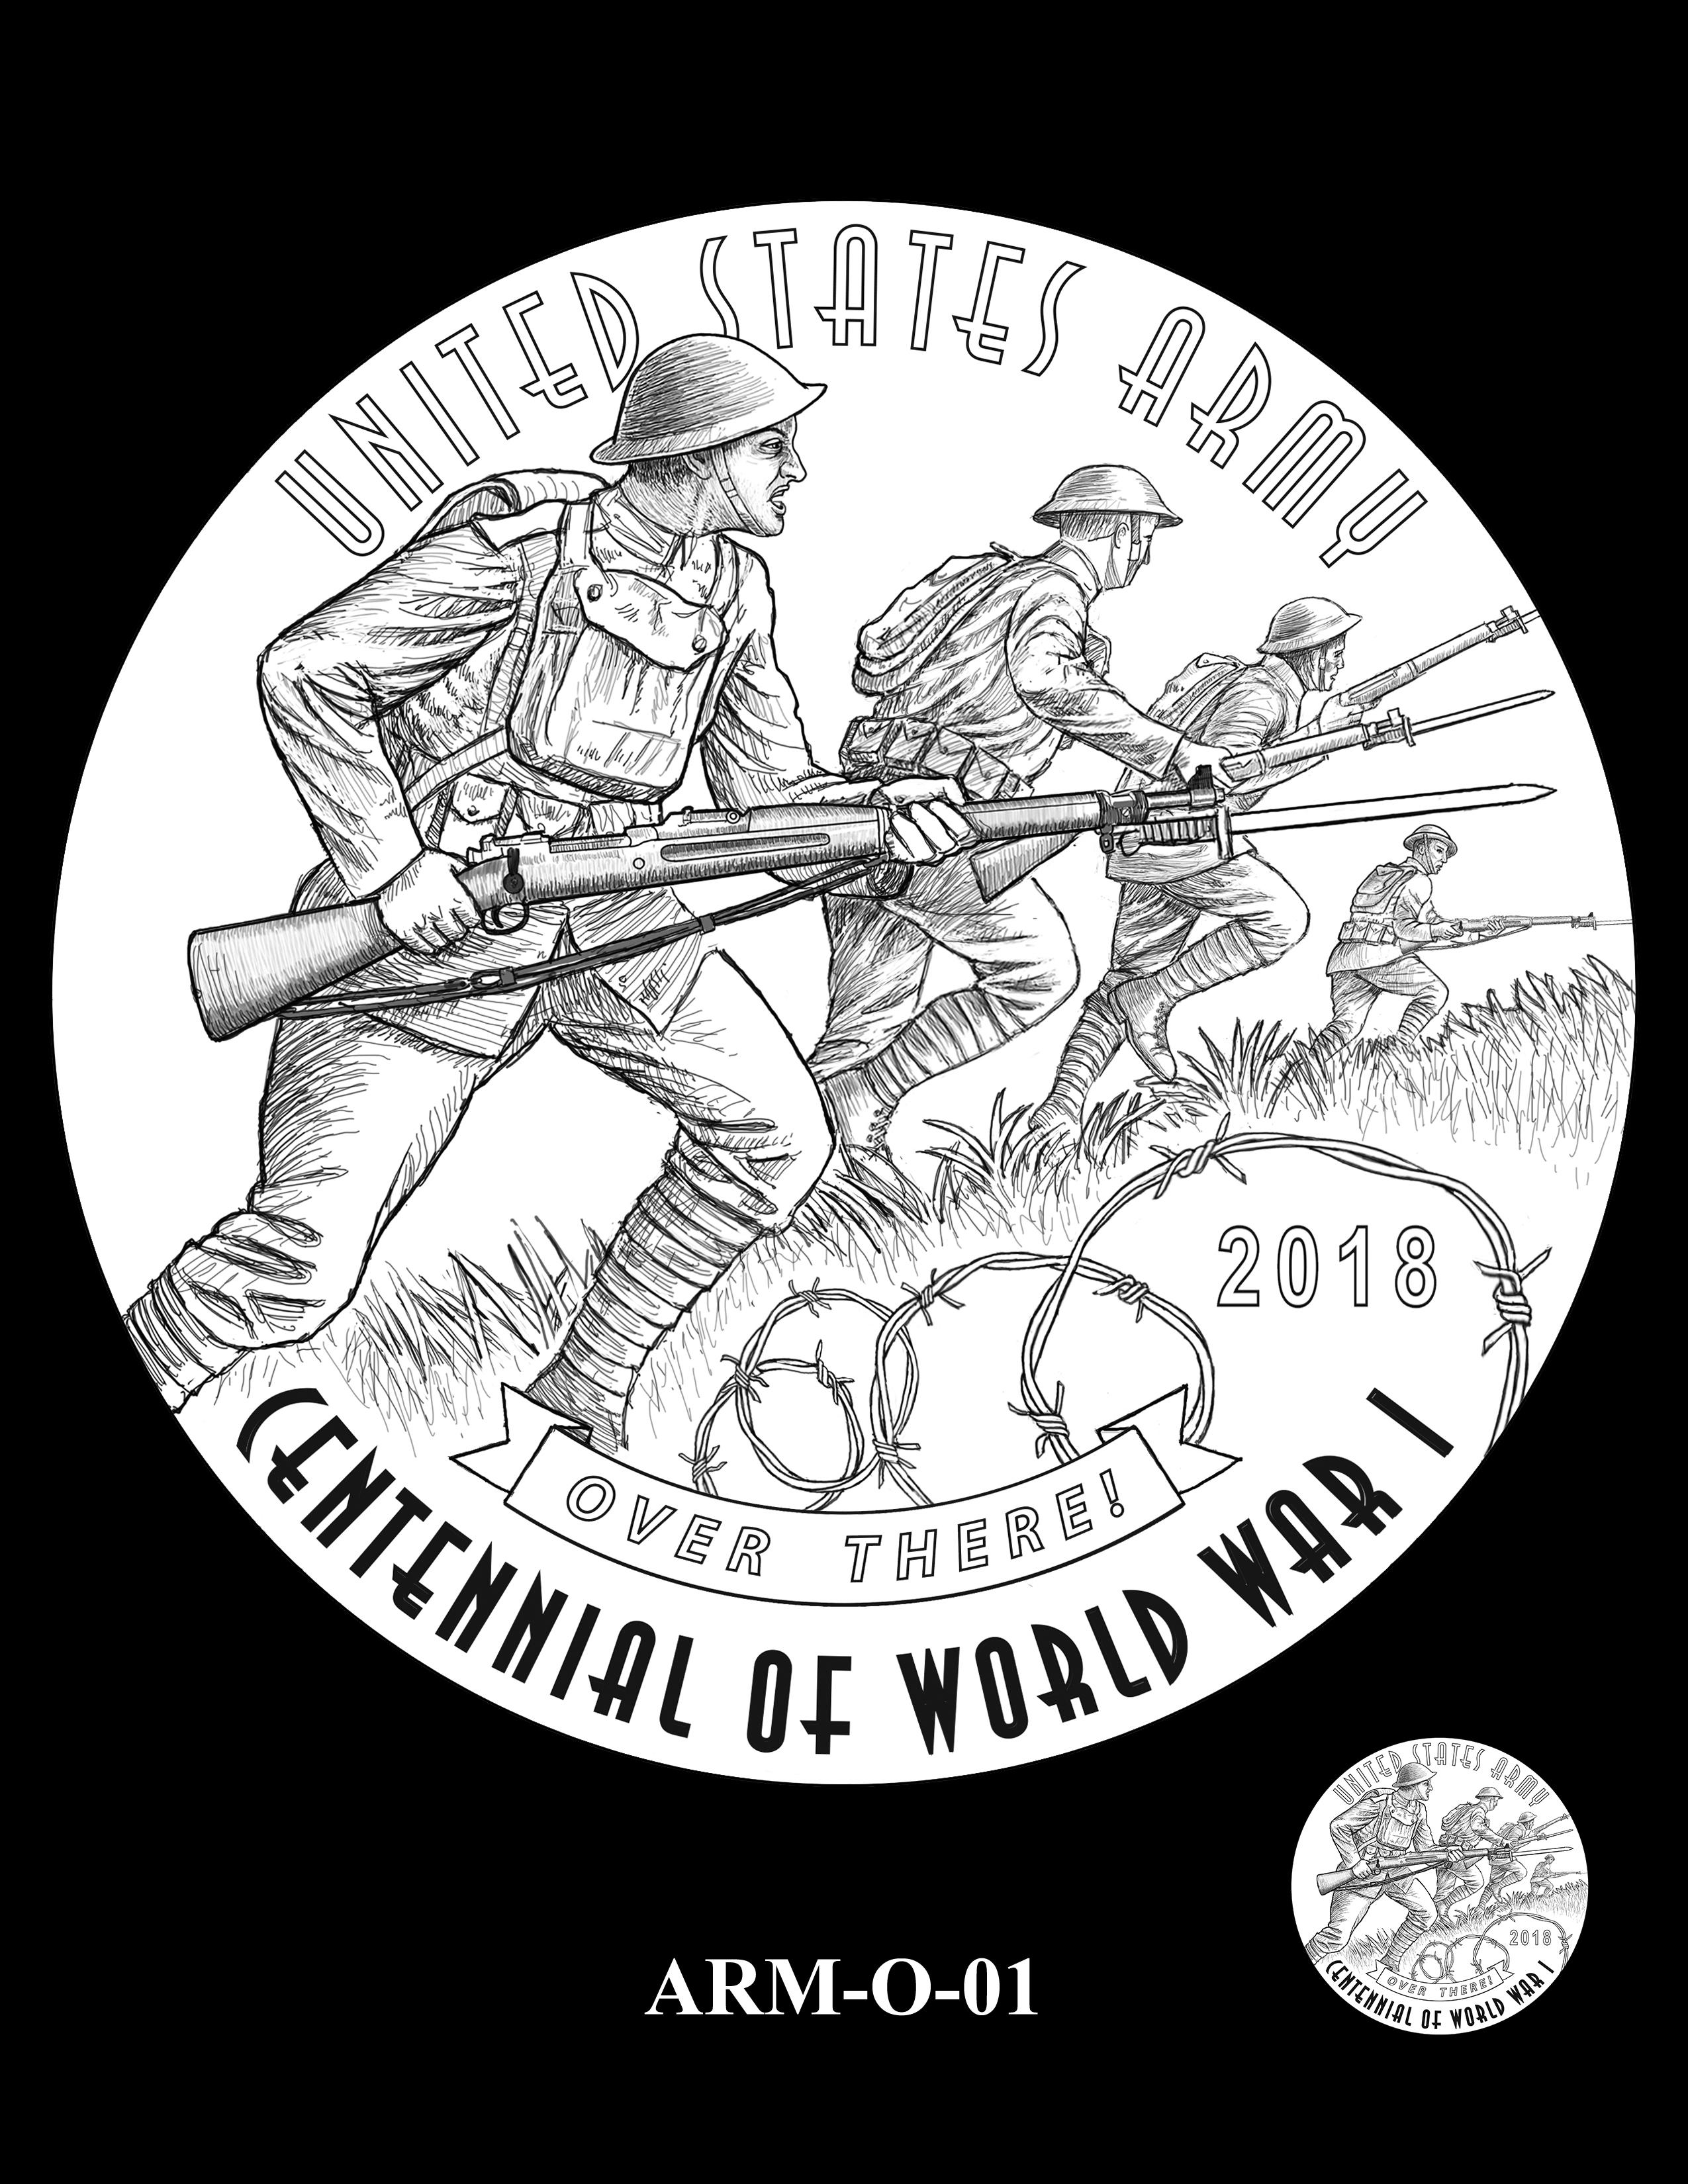 P1-ARM-O-01 -- 2018-World War I Silver Medals - Army